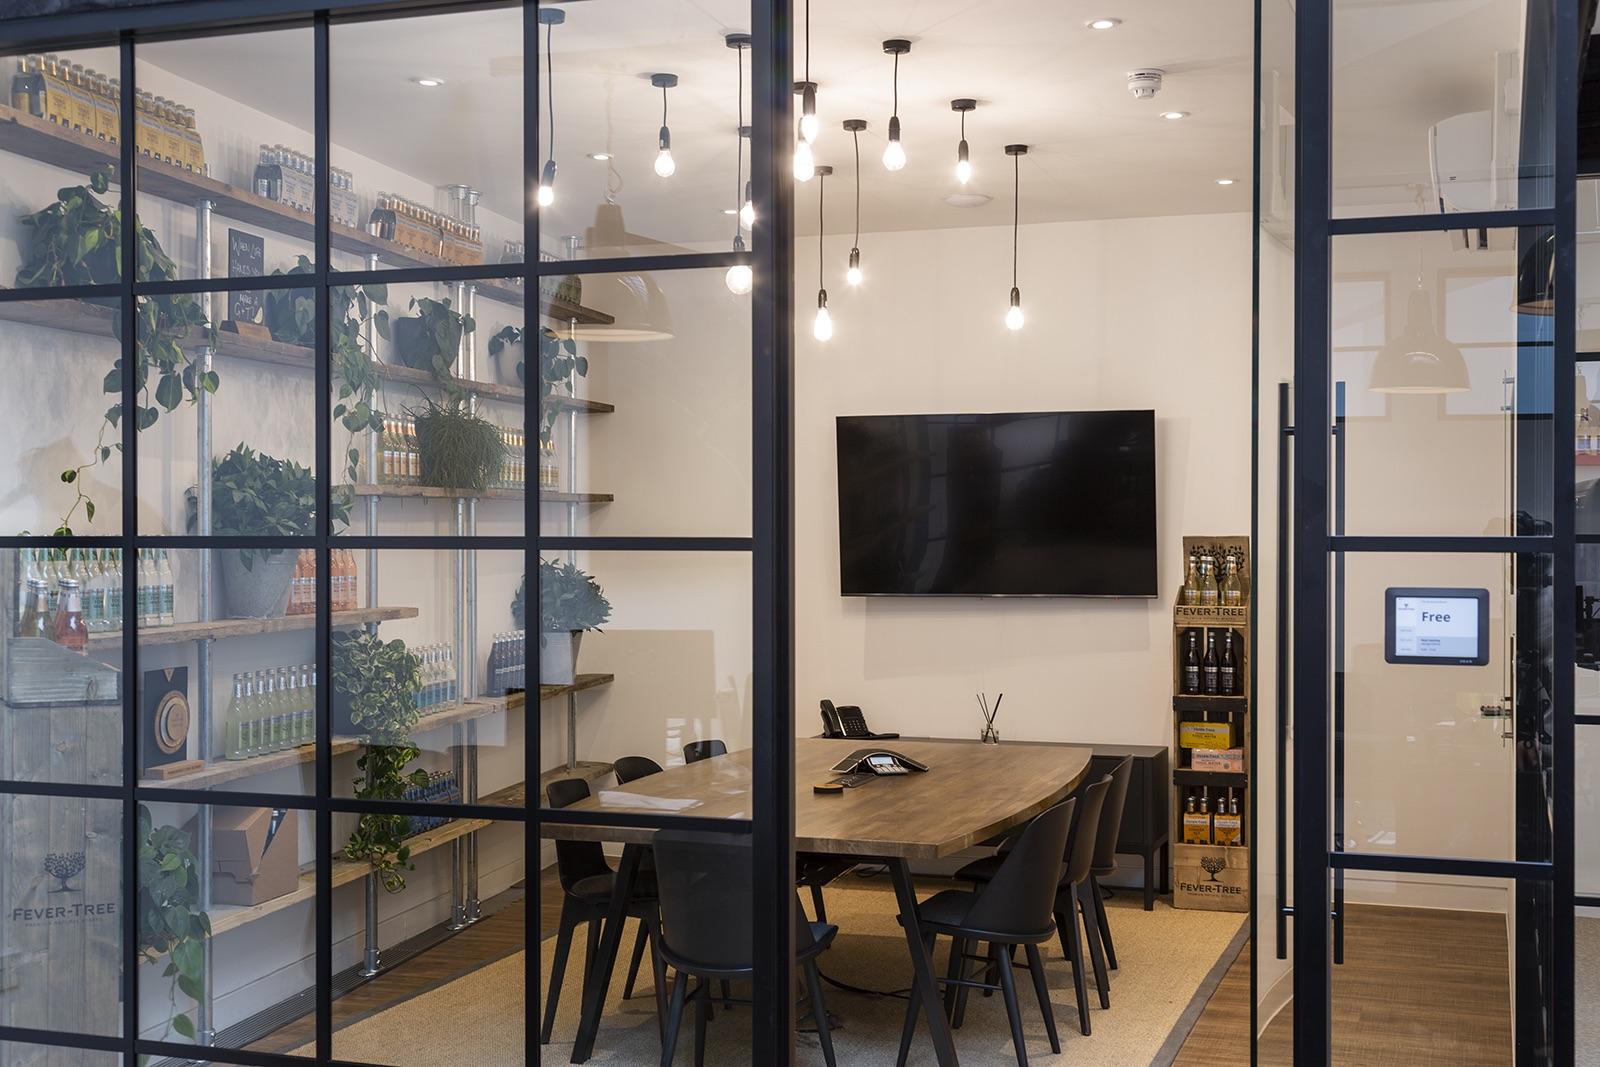 fevertree-office-london-3